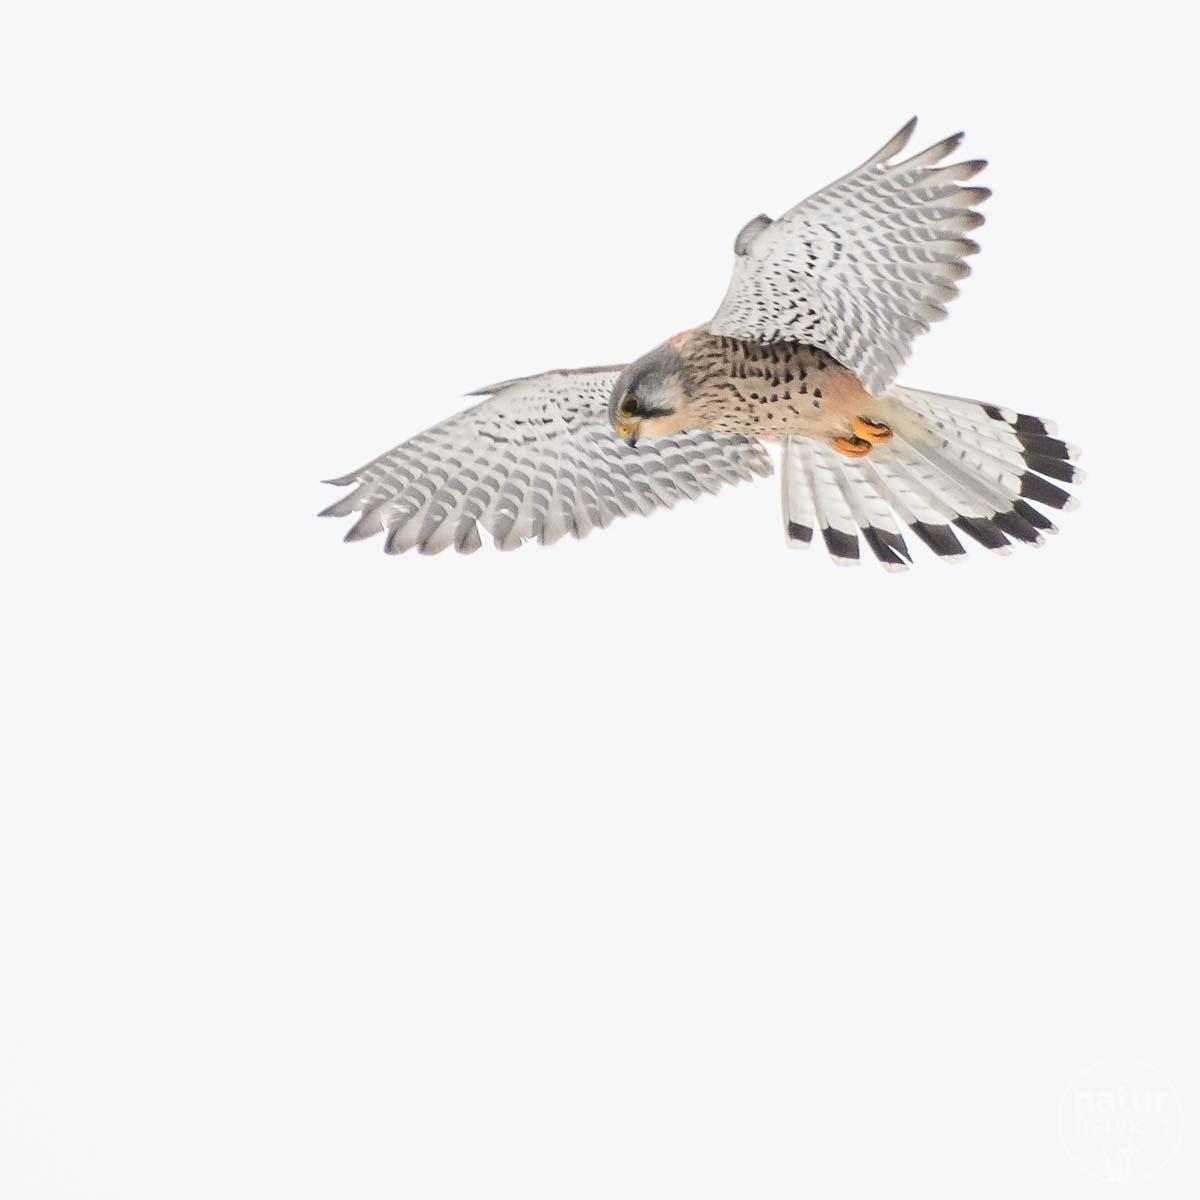 Falke - Vögel lockdownnaturchallenge